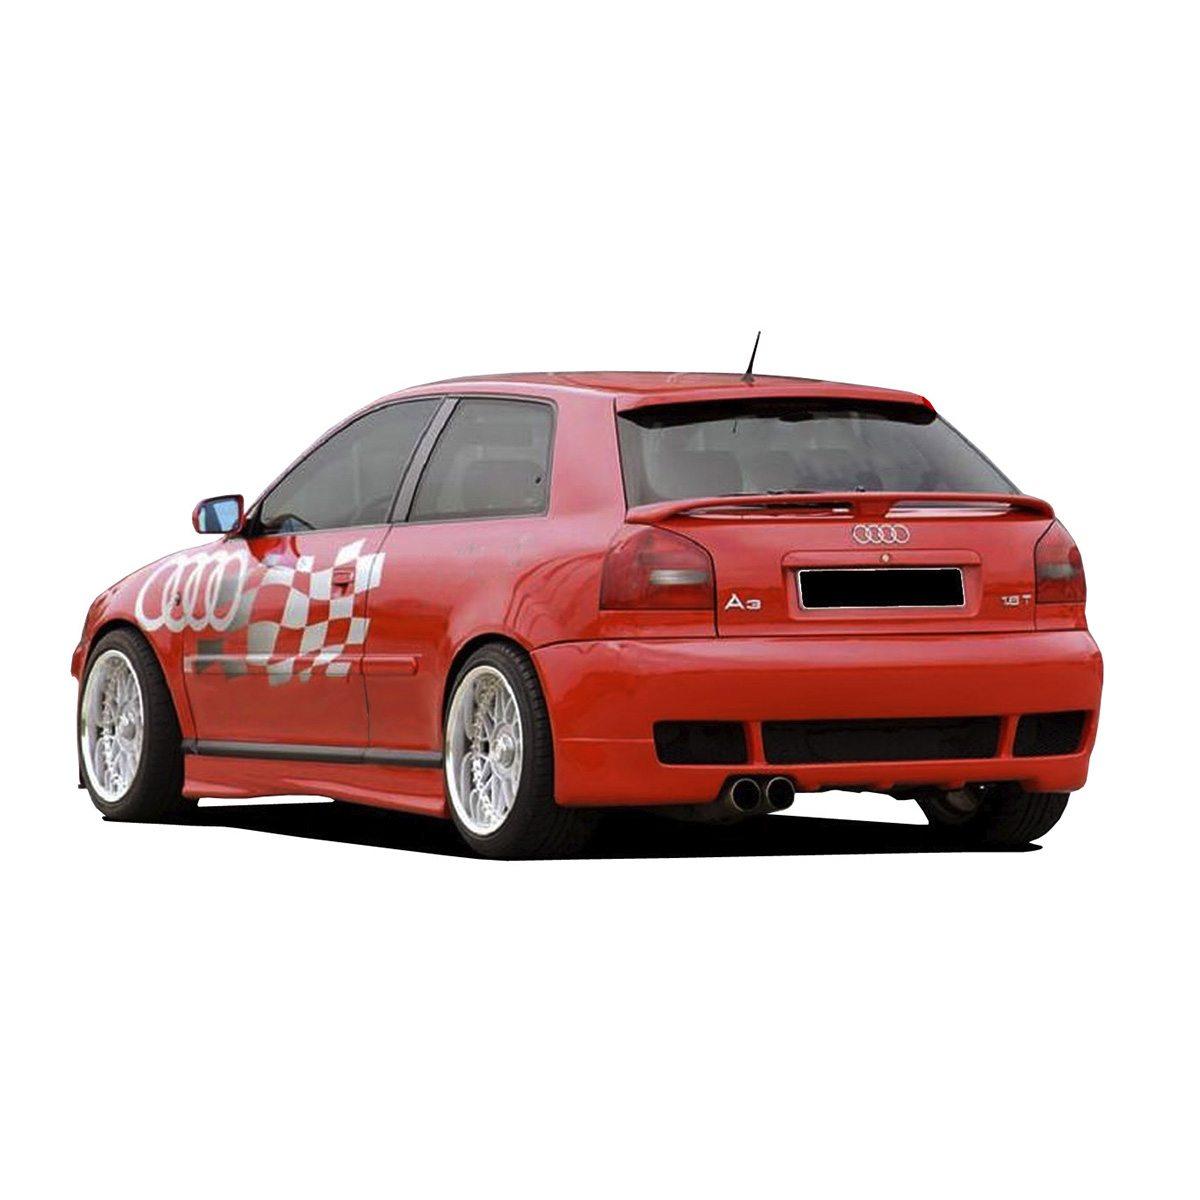 Audi-A3-96-01-New-Style-Tras-PCU0020.1